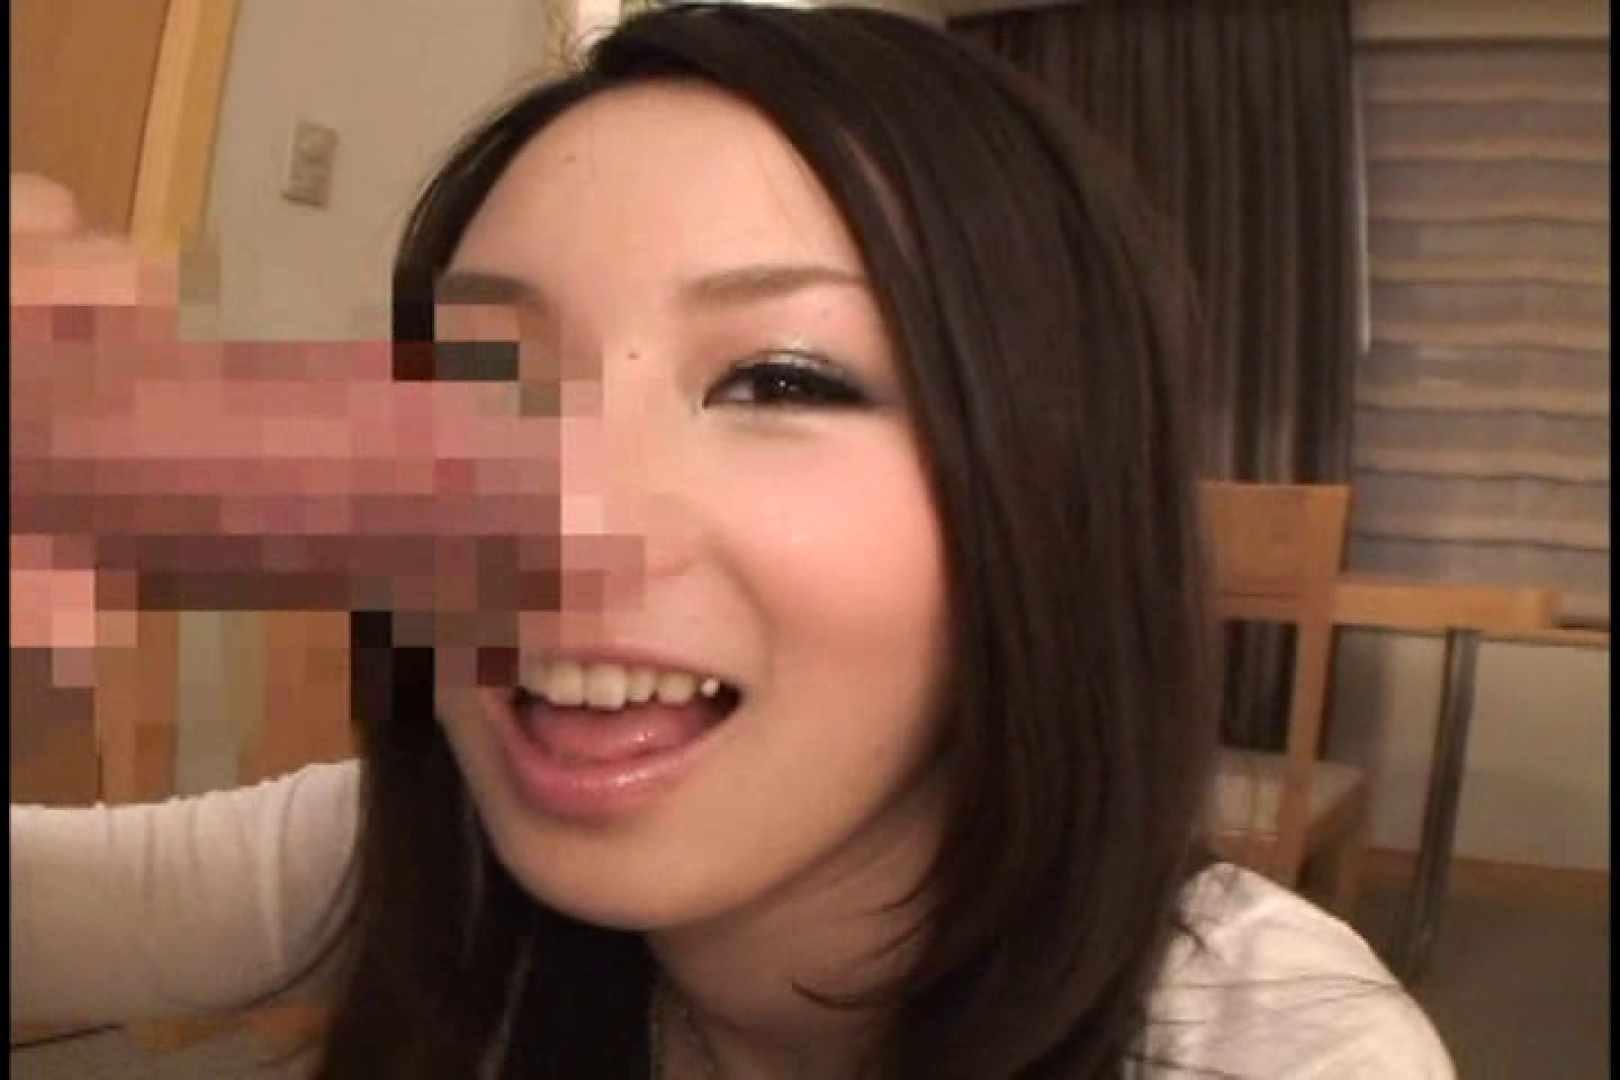 JDハンター全国ツアー vol.045 後編 女子大生のエロ動画 | 0  91PIX 31